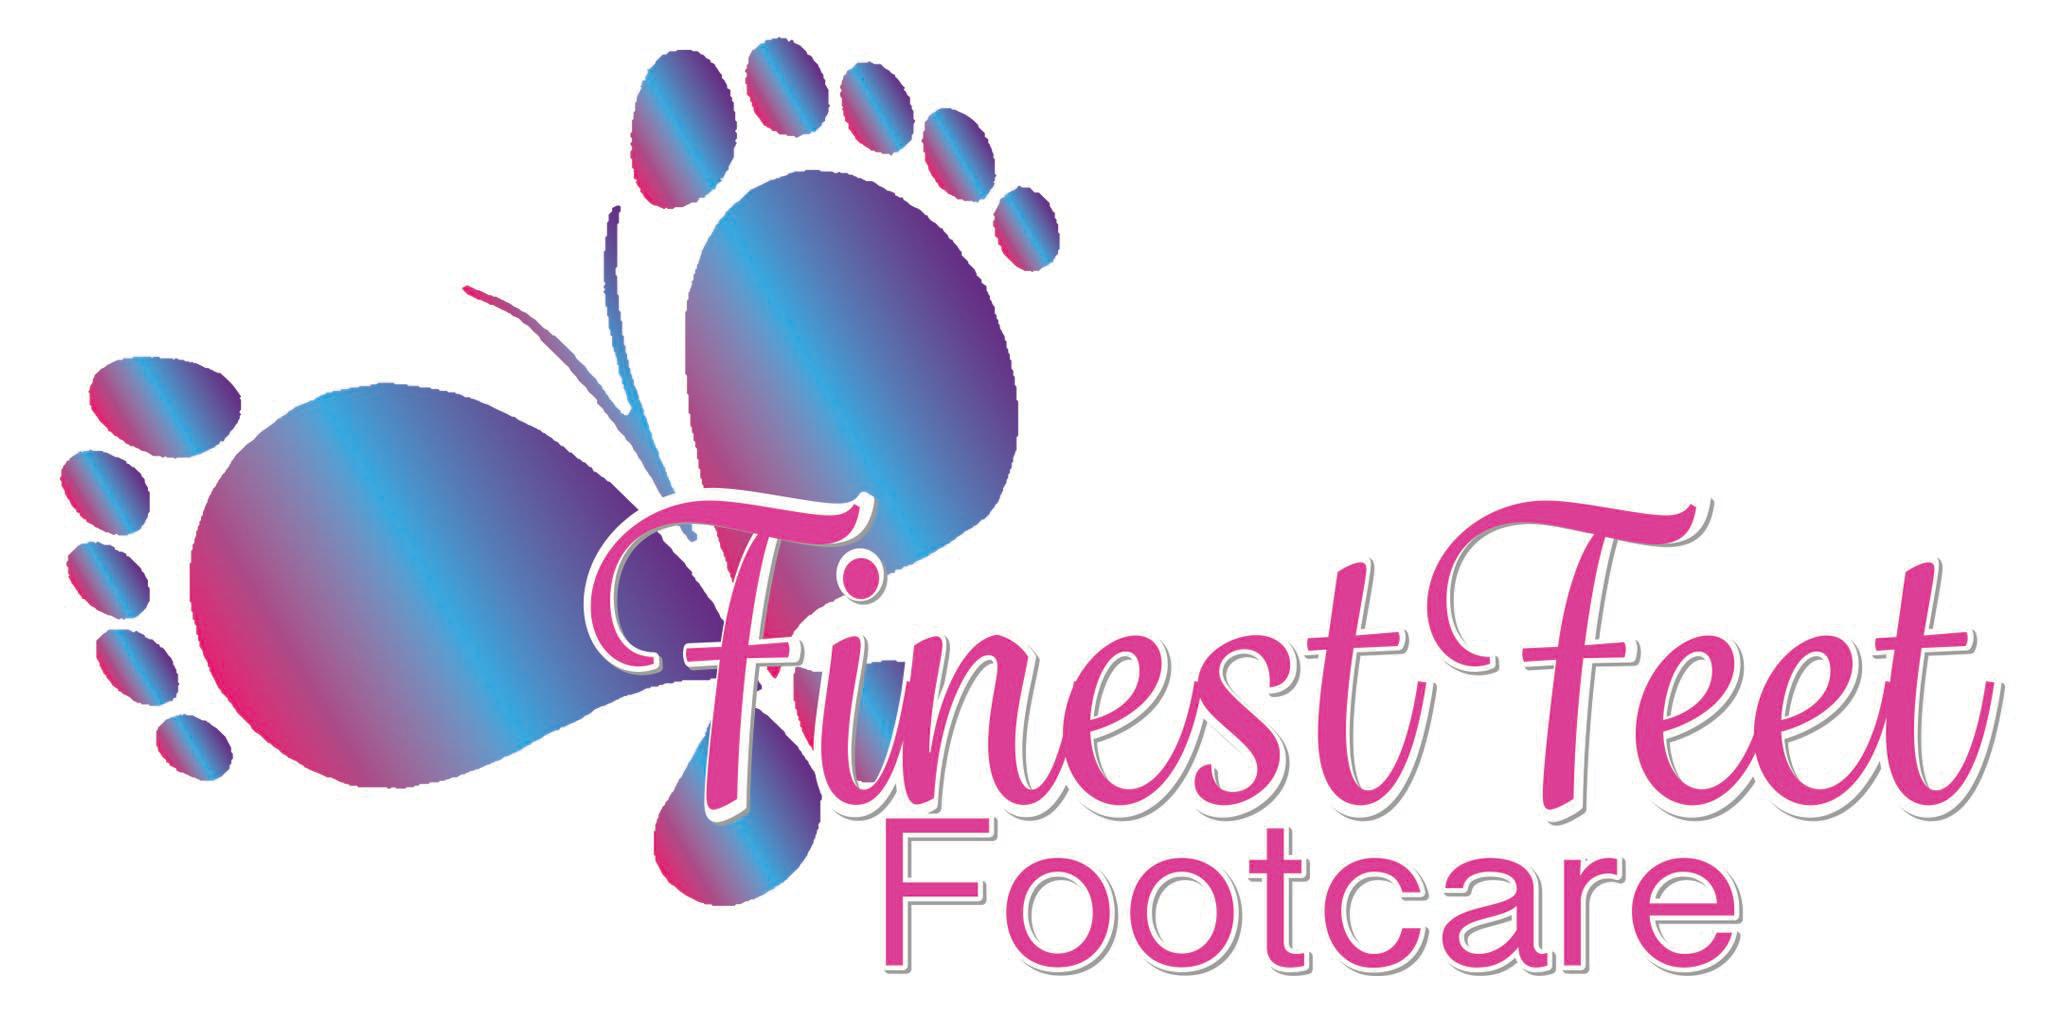 Finest Feet Footcare Logo